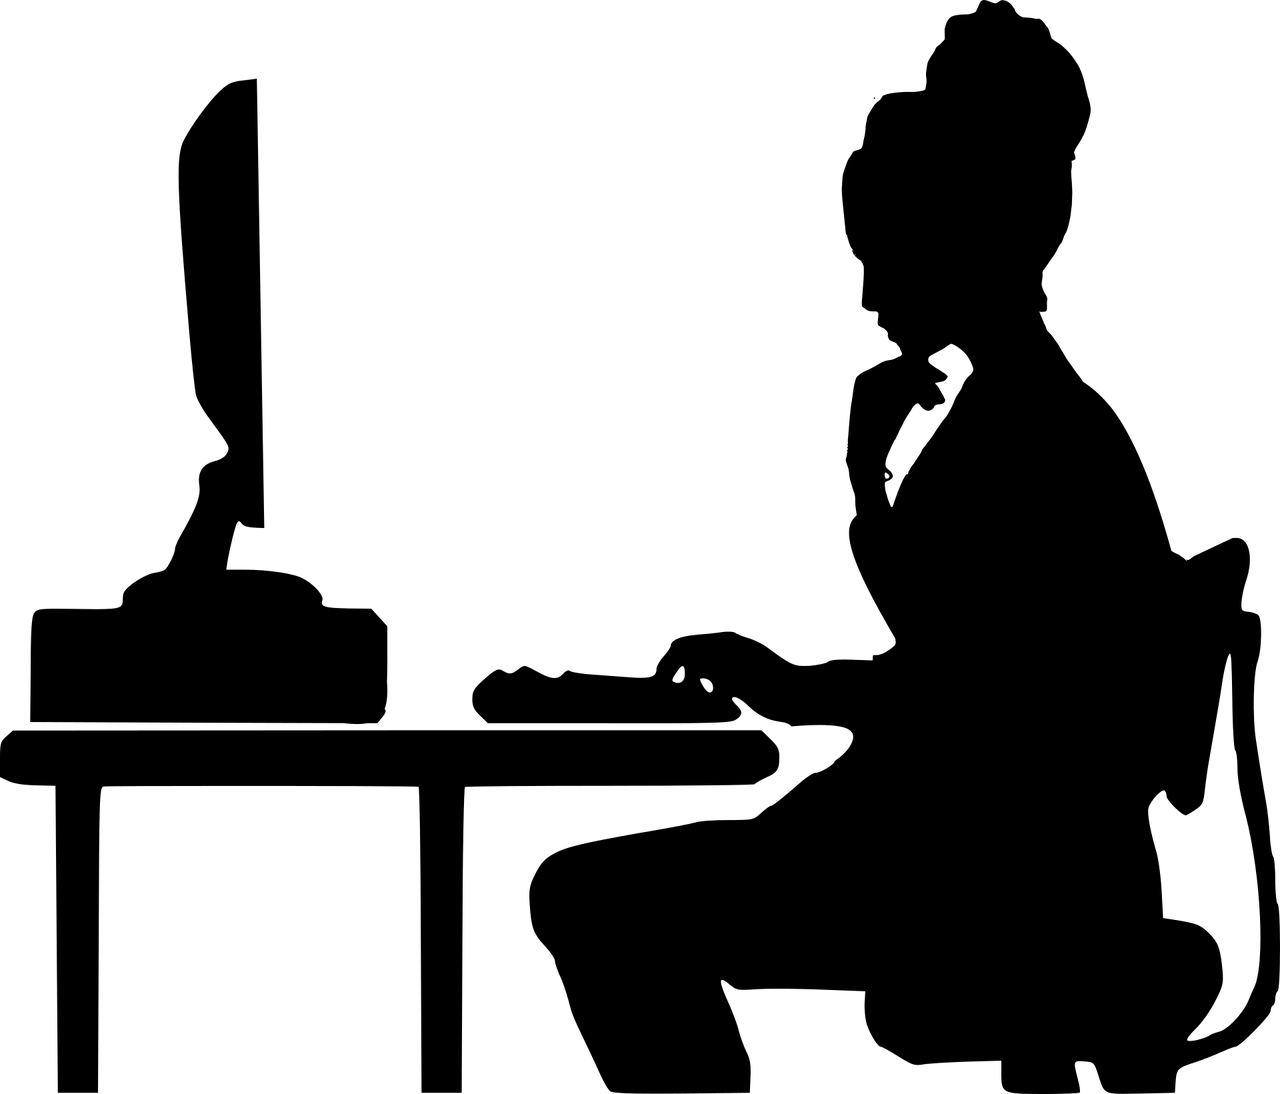 【Linux初心者のエンジニア向け】よく使うLinuxコマンドと覚え方のアイキャッチイメージ